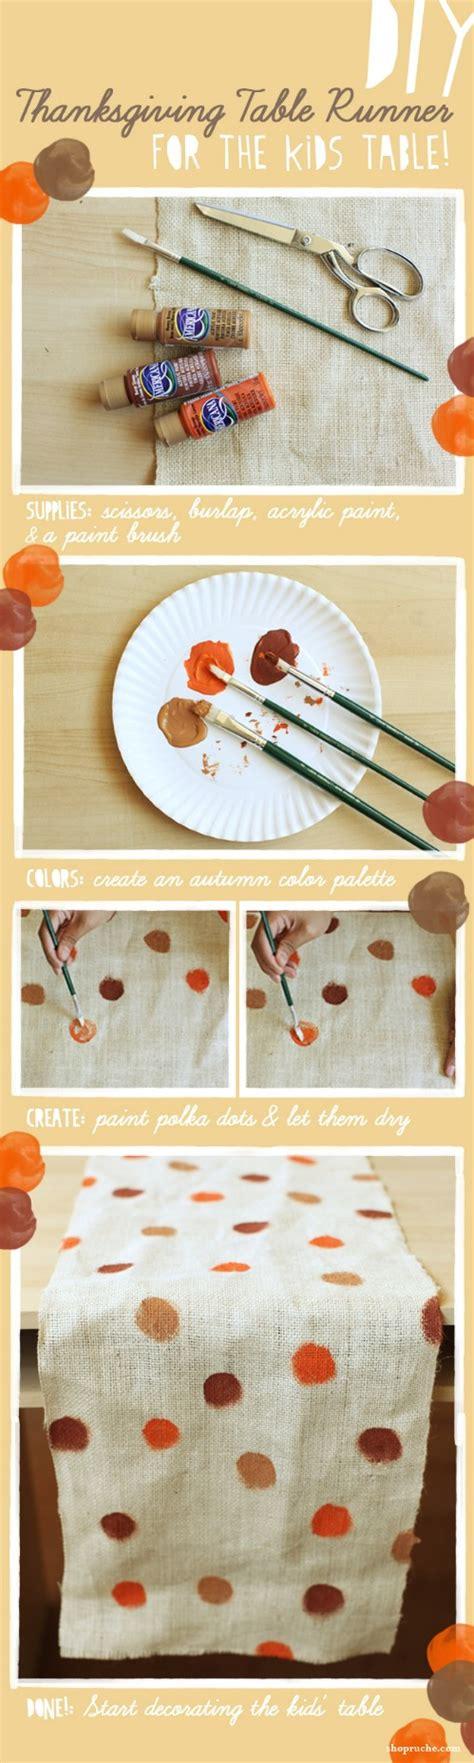 diy thanksgiving decorations 15 wonderful diy thanksgiving decorations for your home